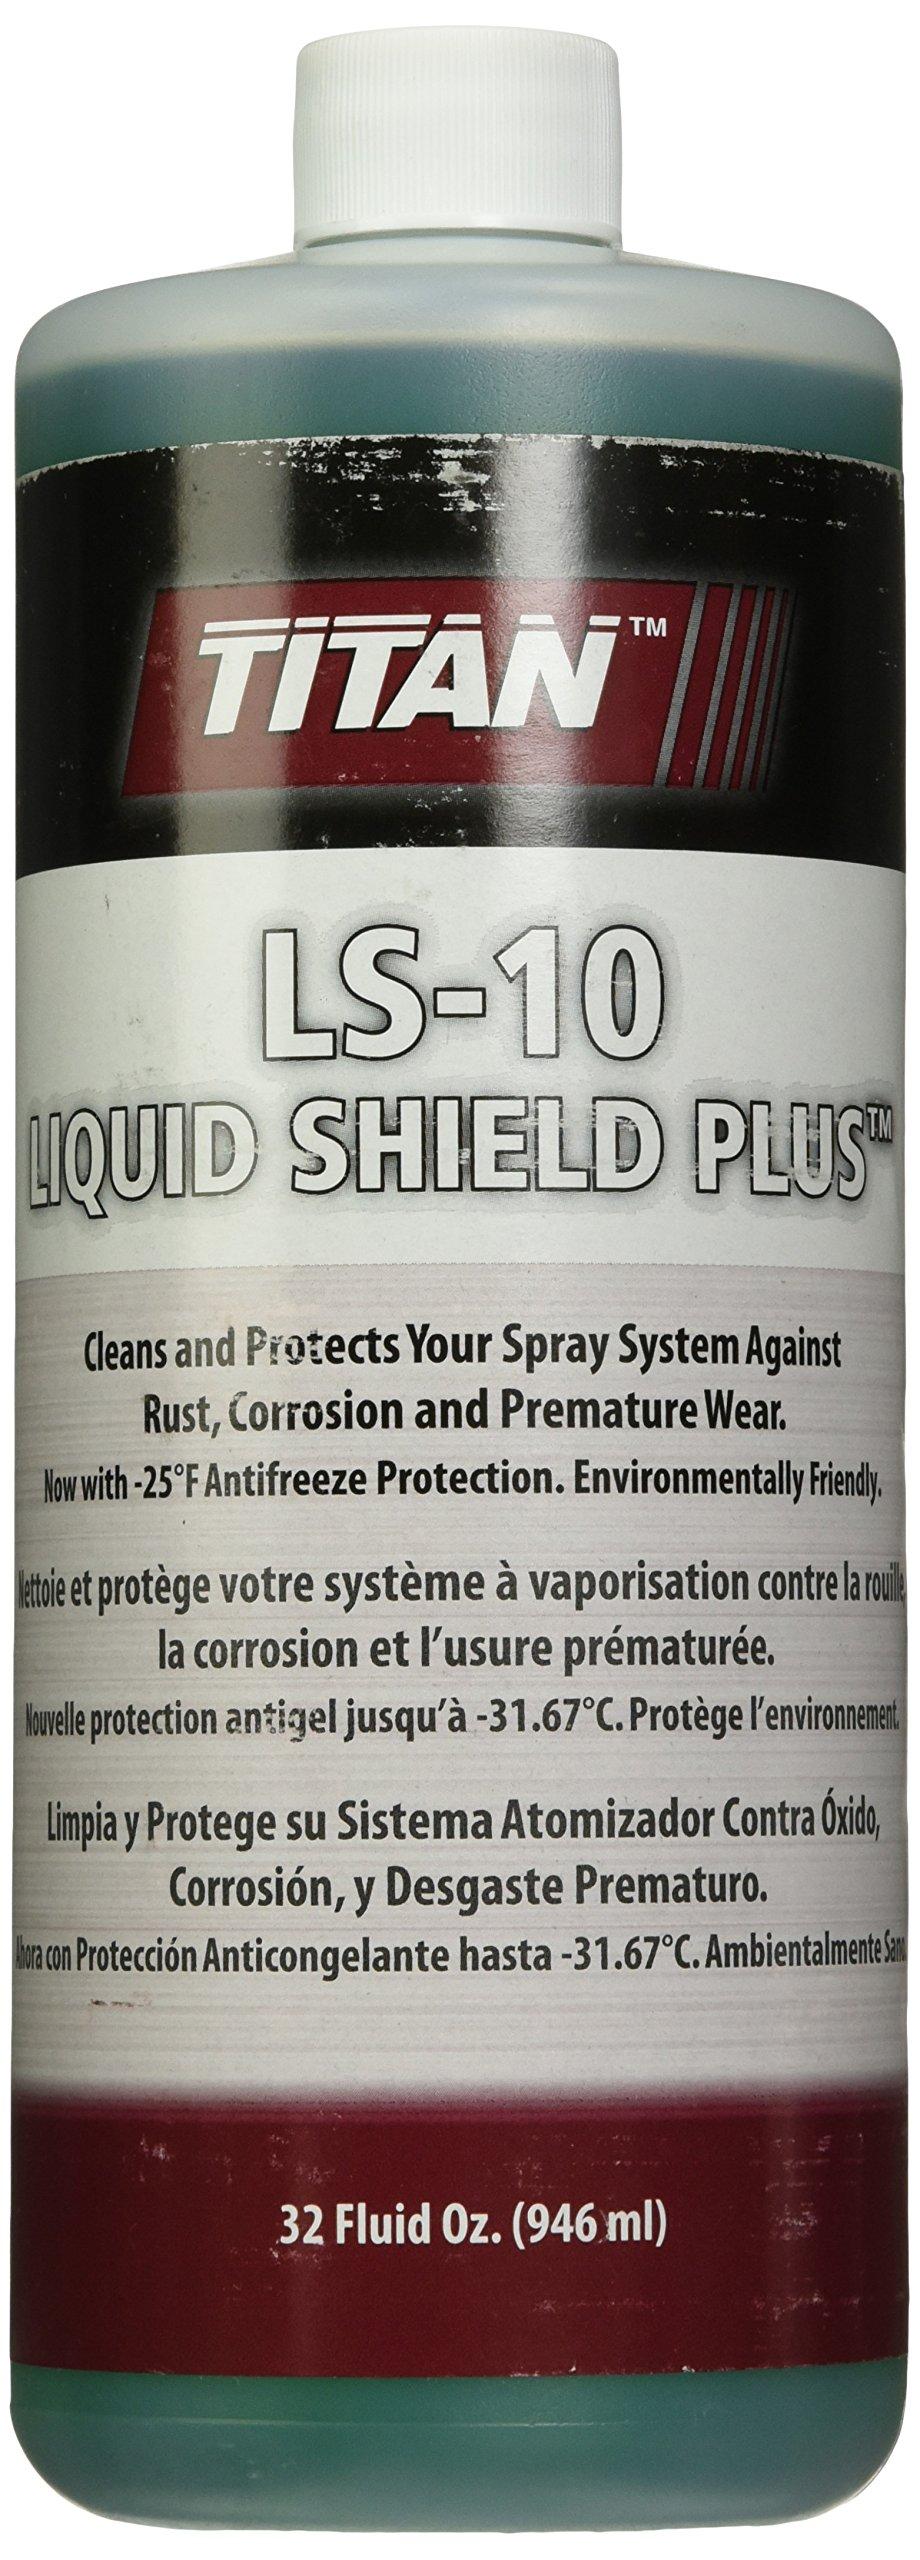 Wagner 0297055 Paint Sprayer Pump Shield, 12 Oz